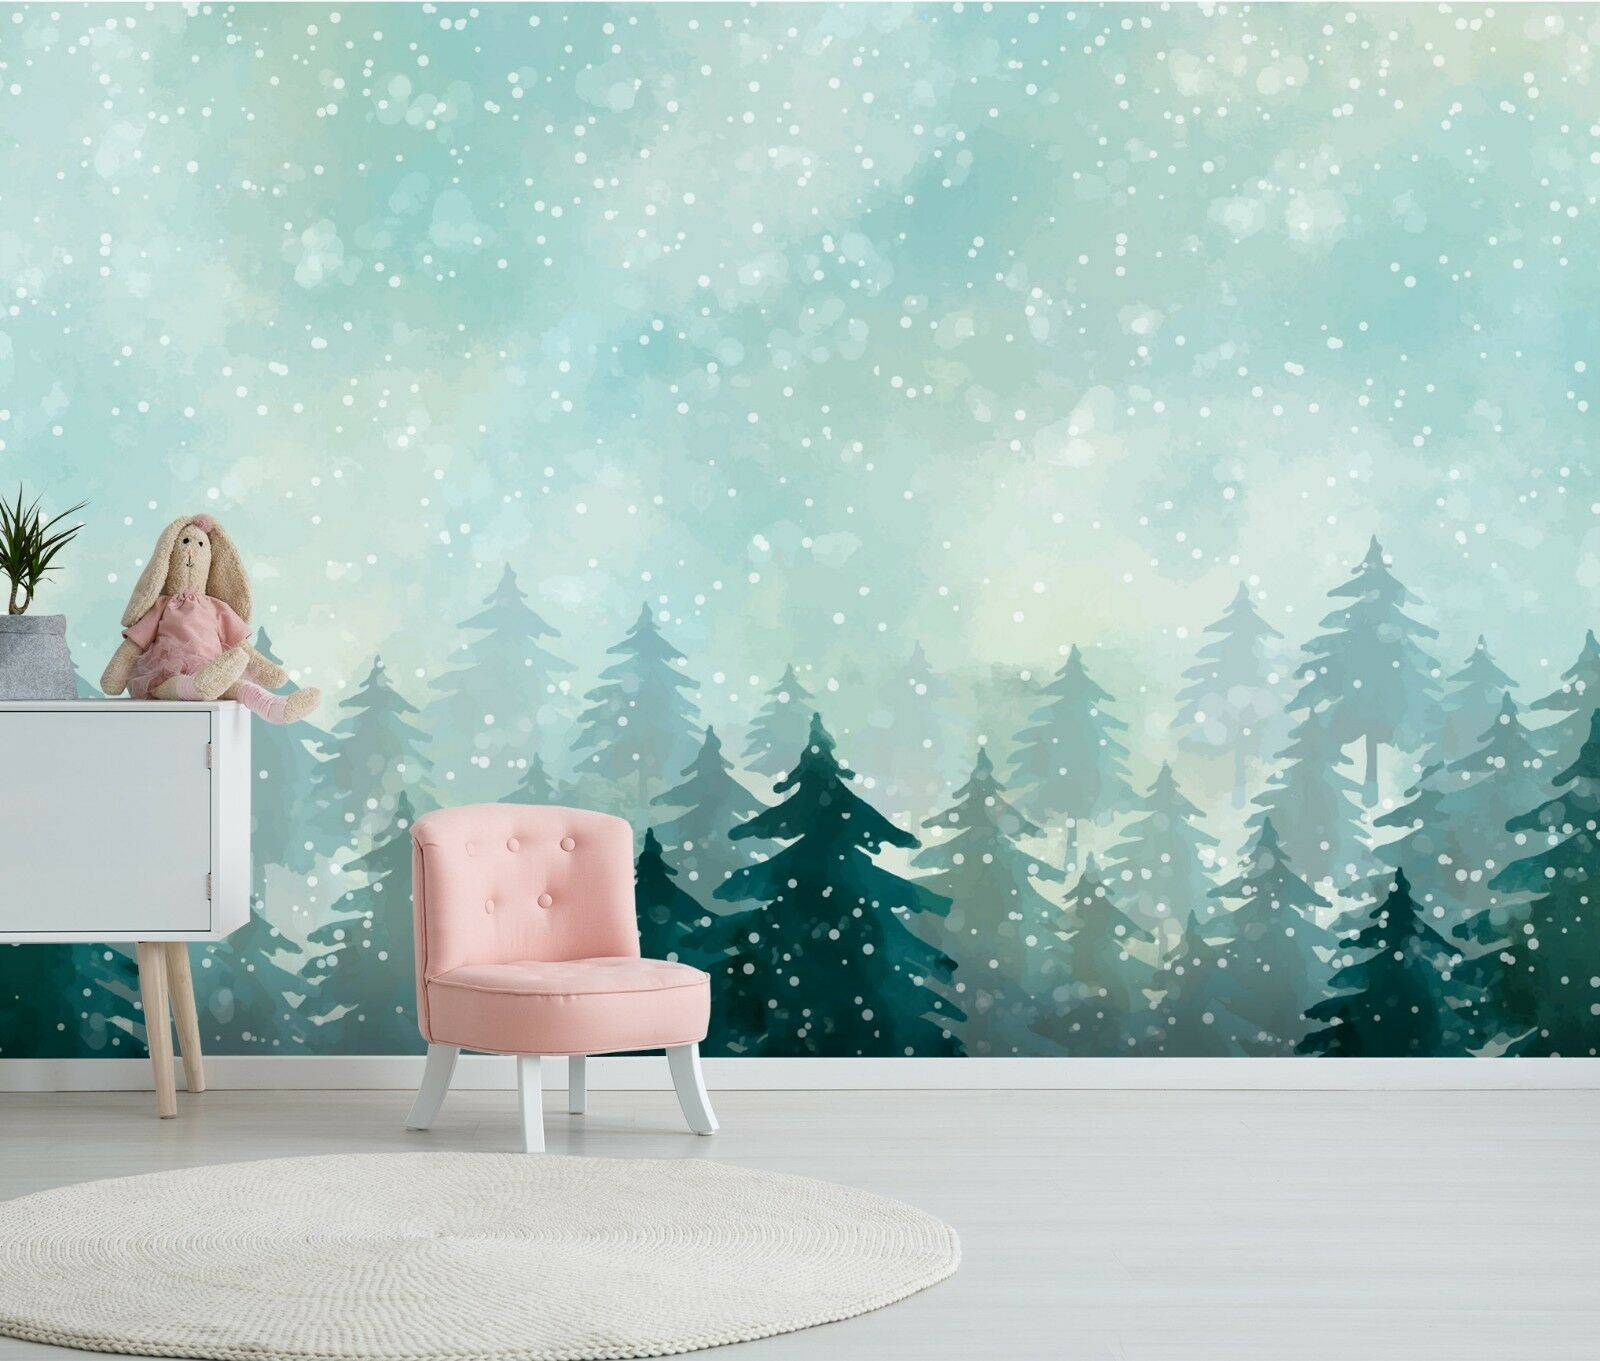 3D Snowflake Forest 564 Wallpaper Murals Wall Print Wallpaper Mural AJ WALL AU